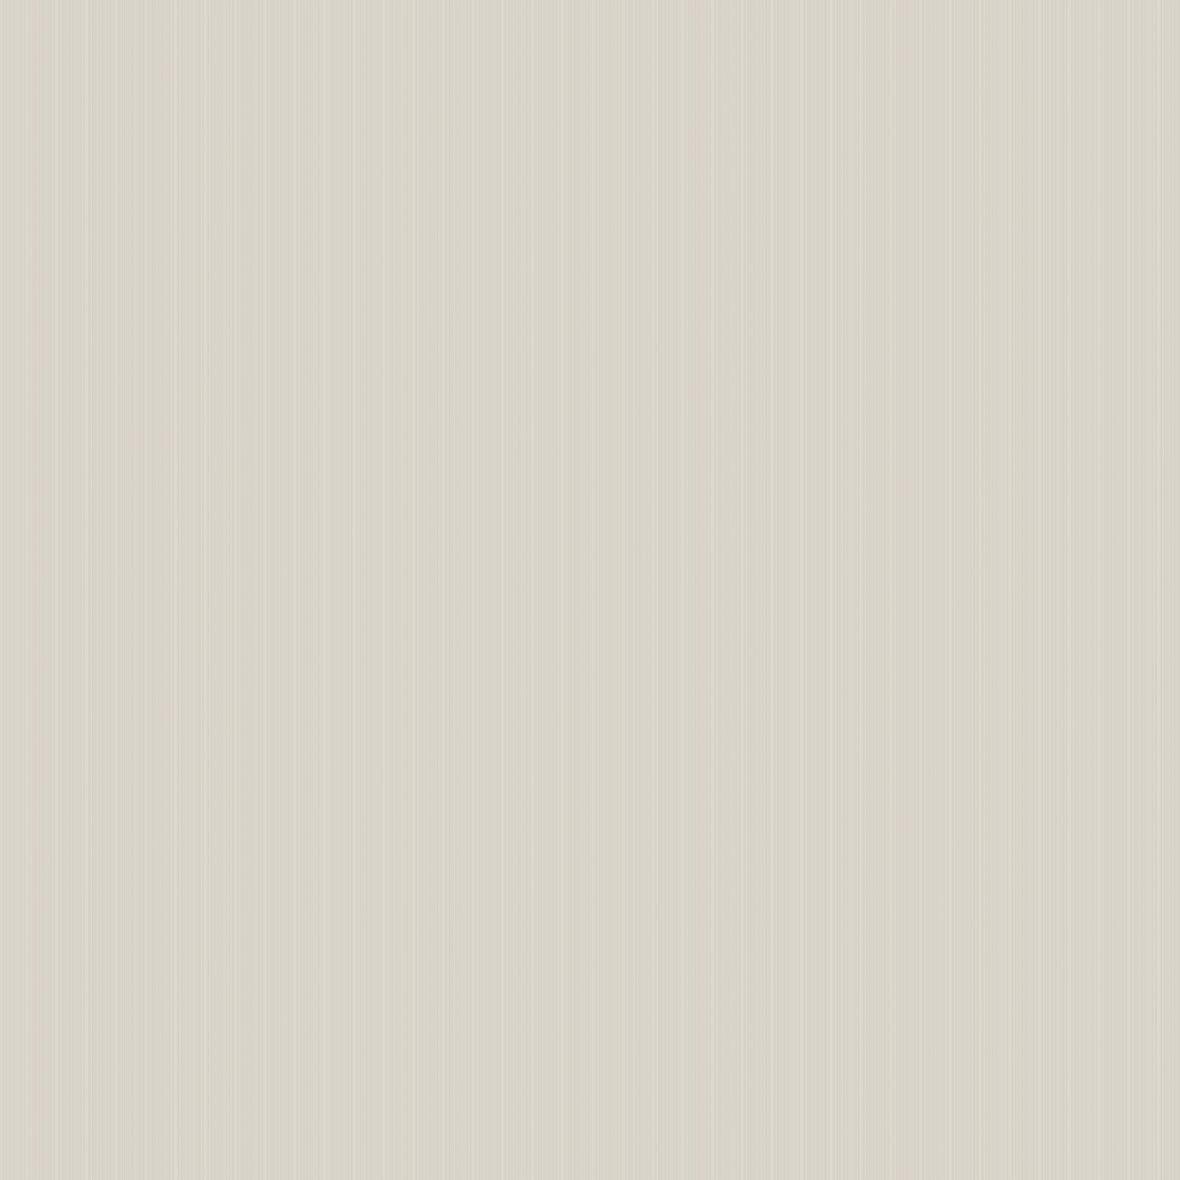 Papel de Parede Convencional Importado Mundi Roviski CD-8902  - Final Decor